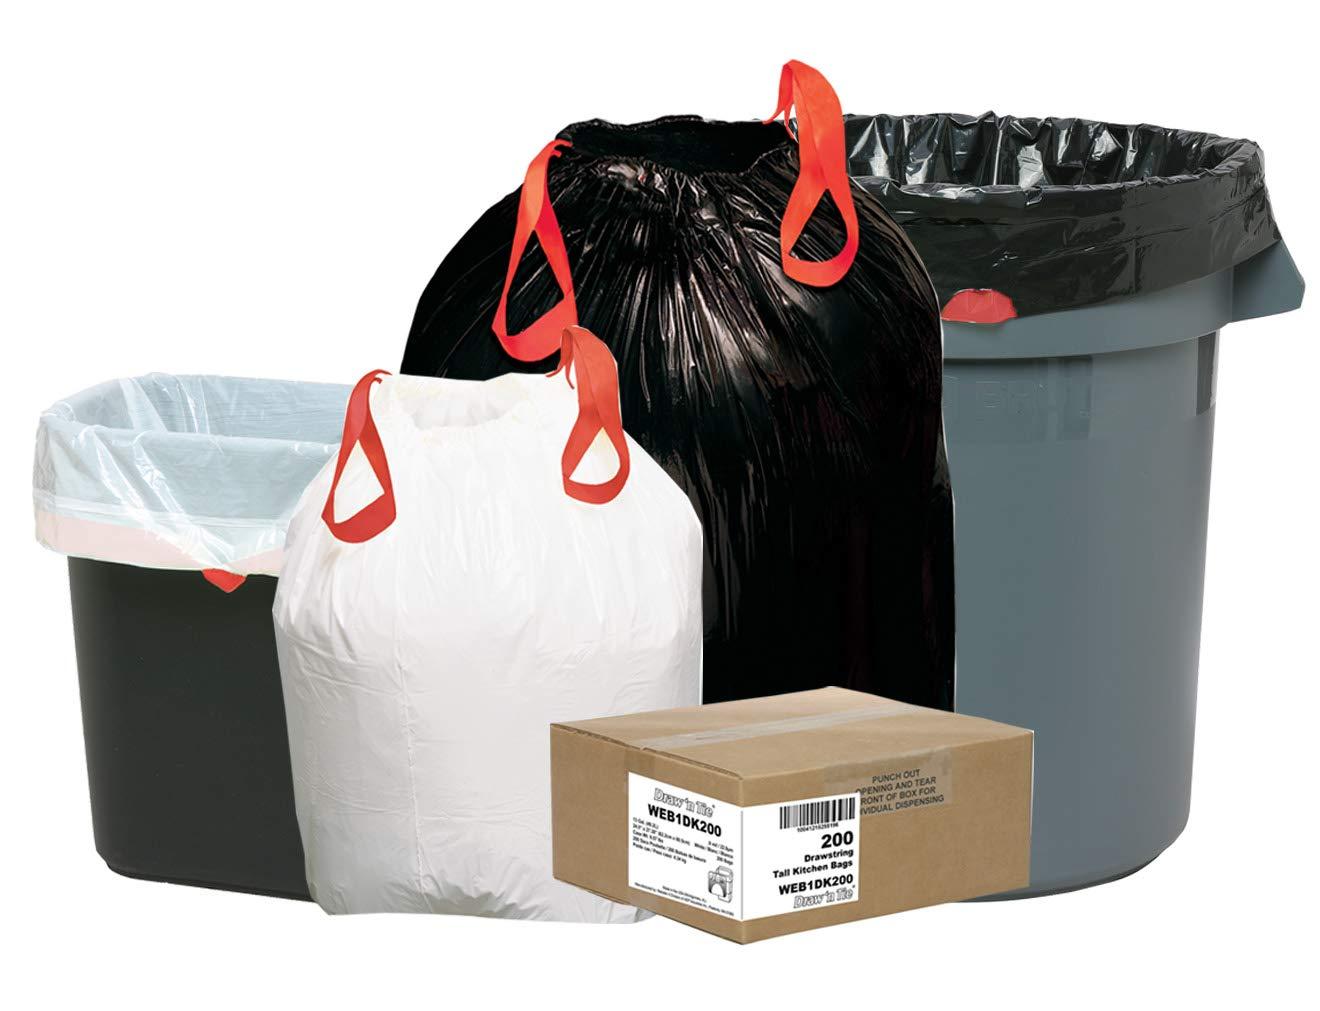 1.2mil 30 1//2 x 33 200 Per Box Draw n Tie 1DT200 Heavy-Duty Bags Black, 30gal